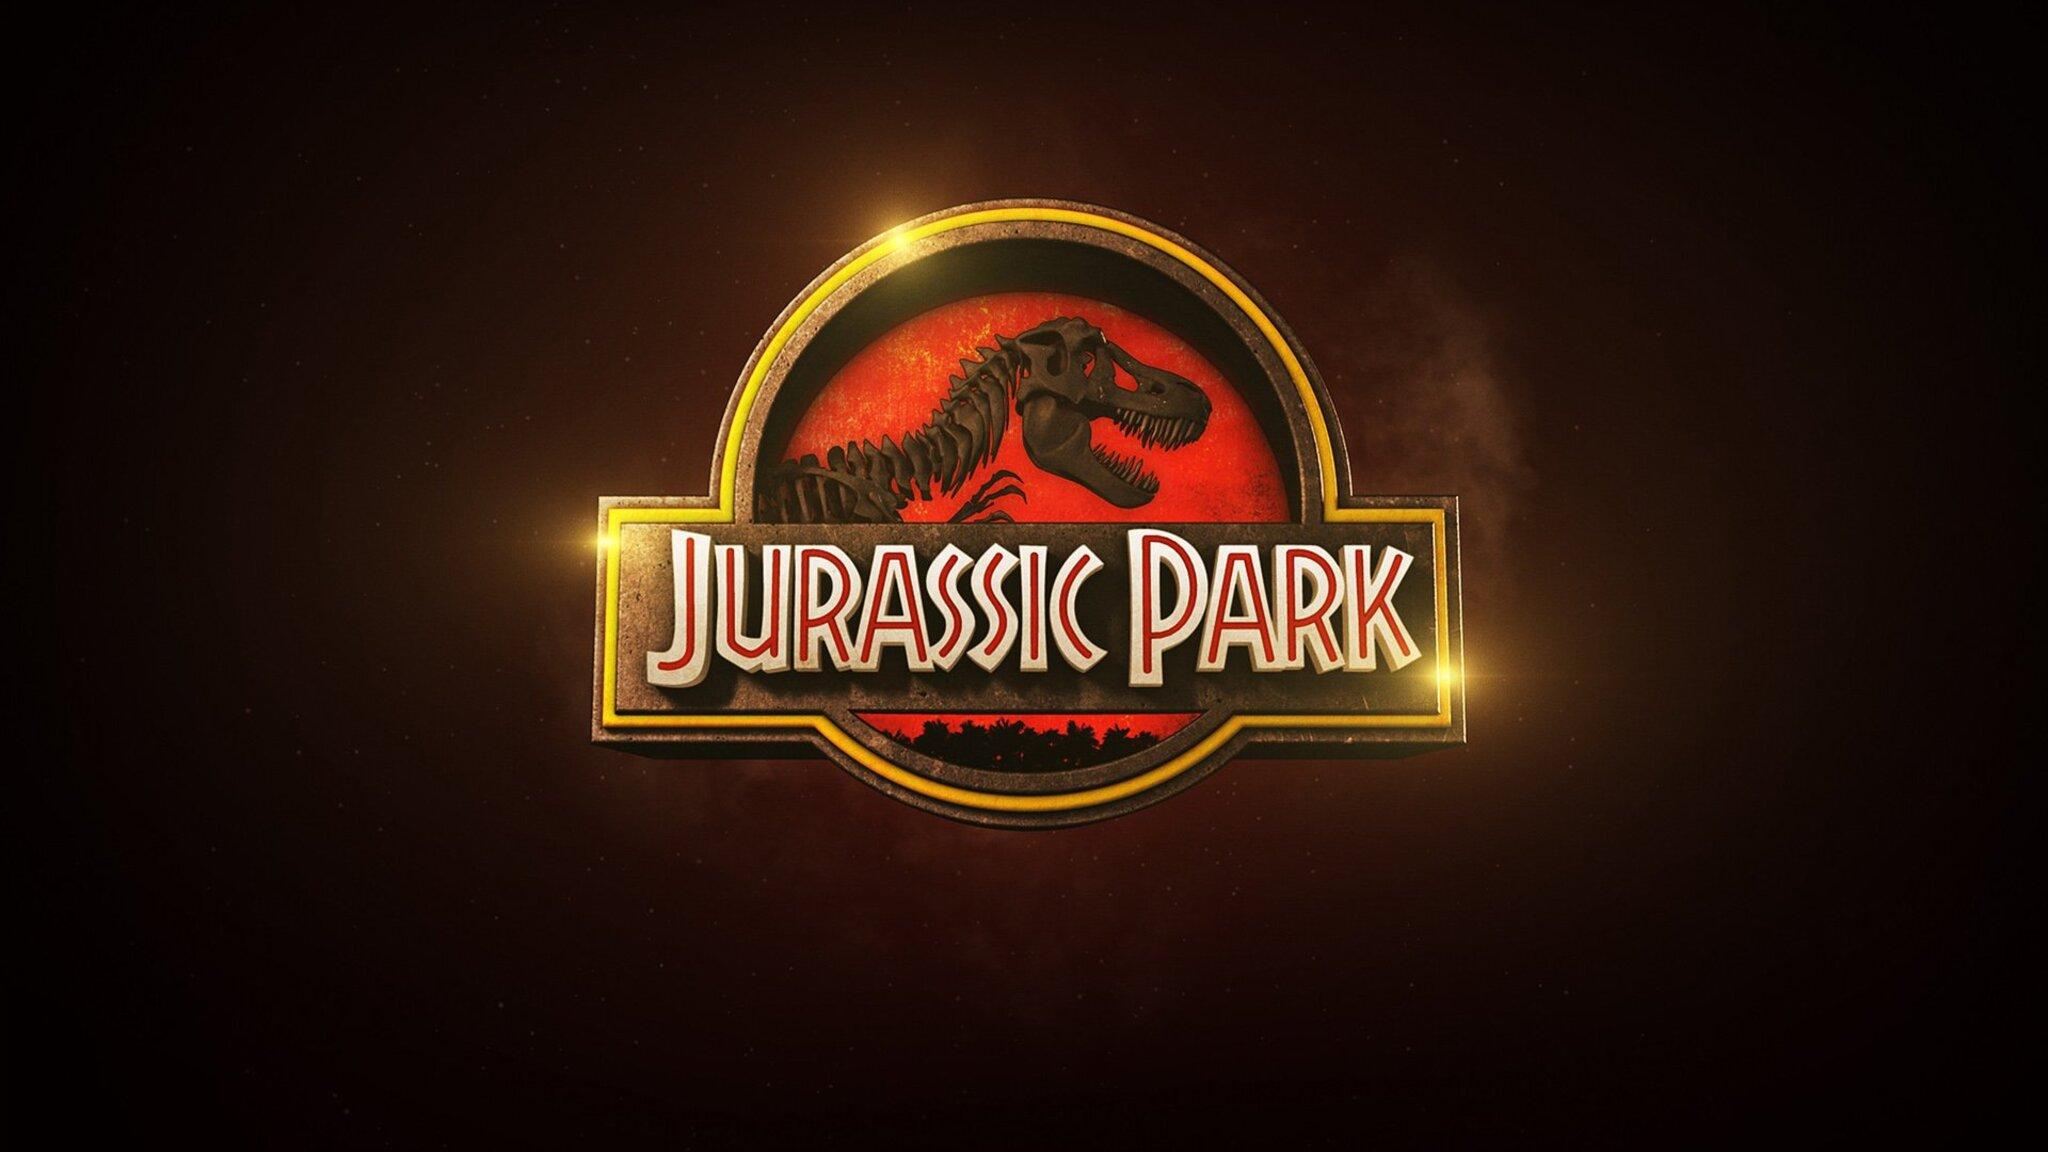 2048x1152 Jurassic Park Logo 2048x1152 Resolution HD 4k ...